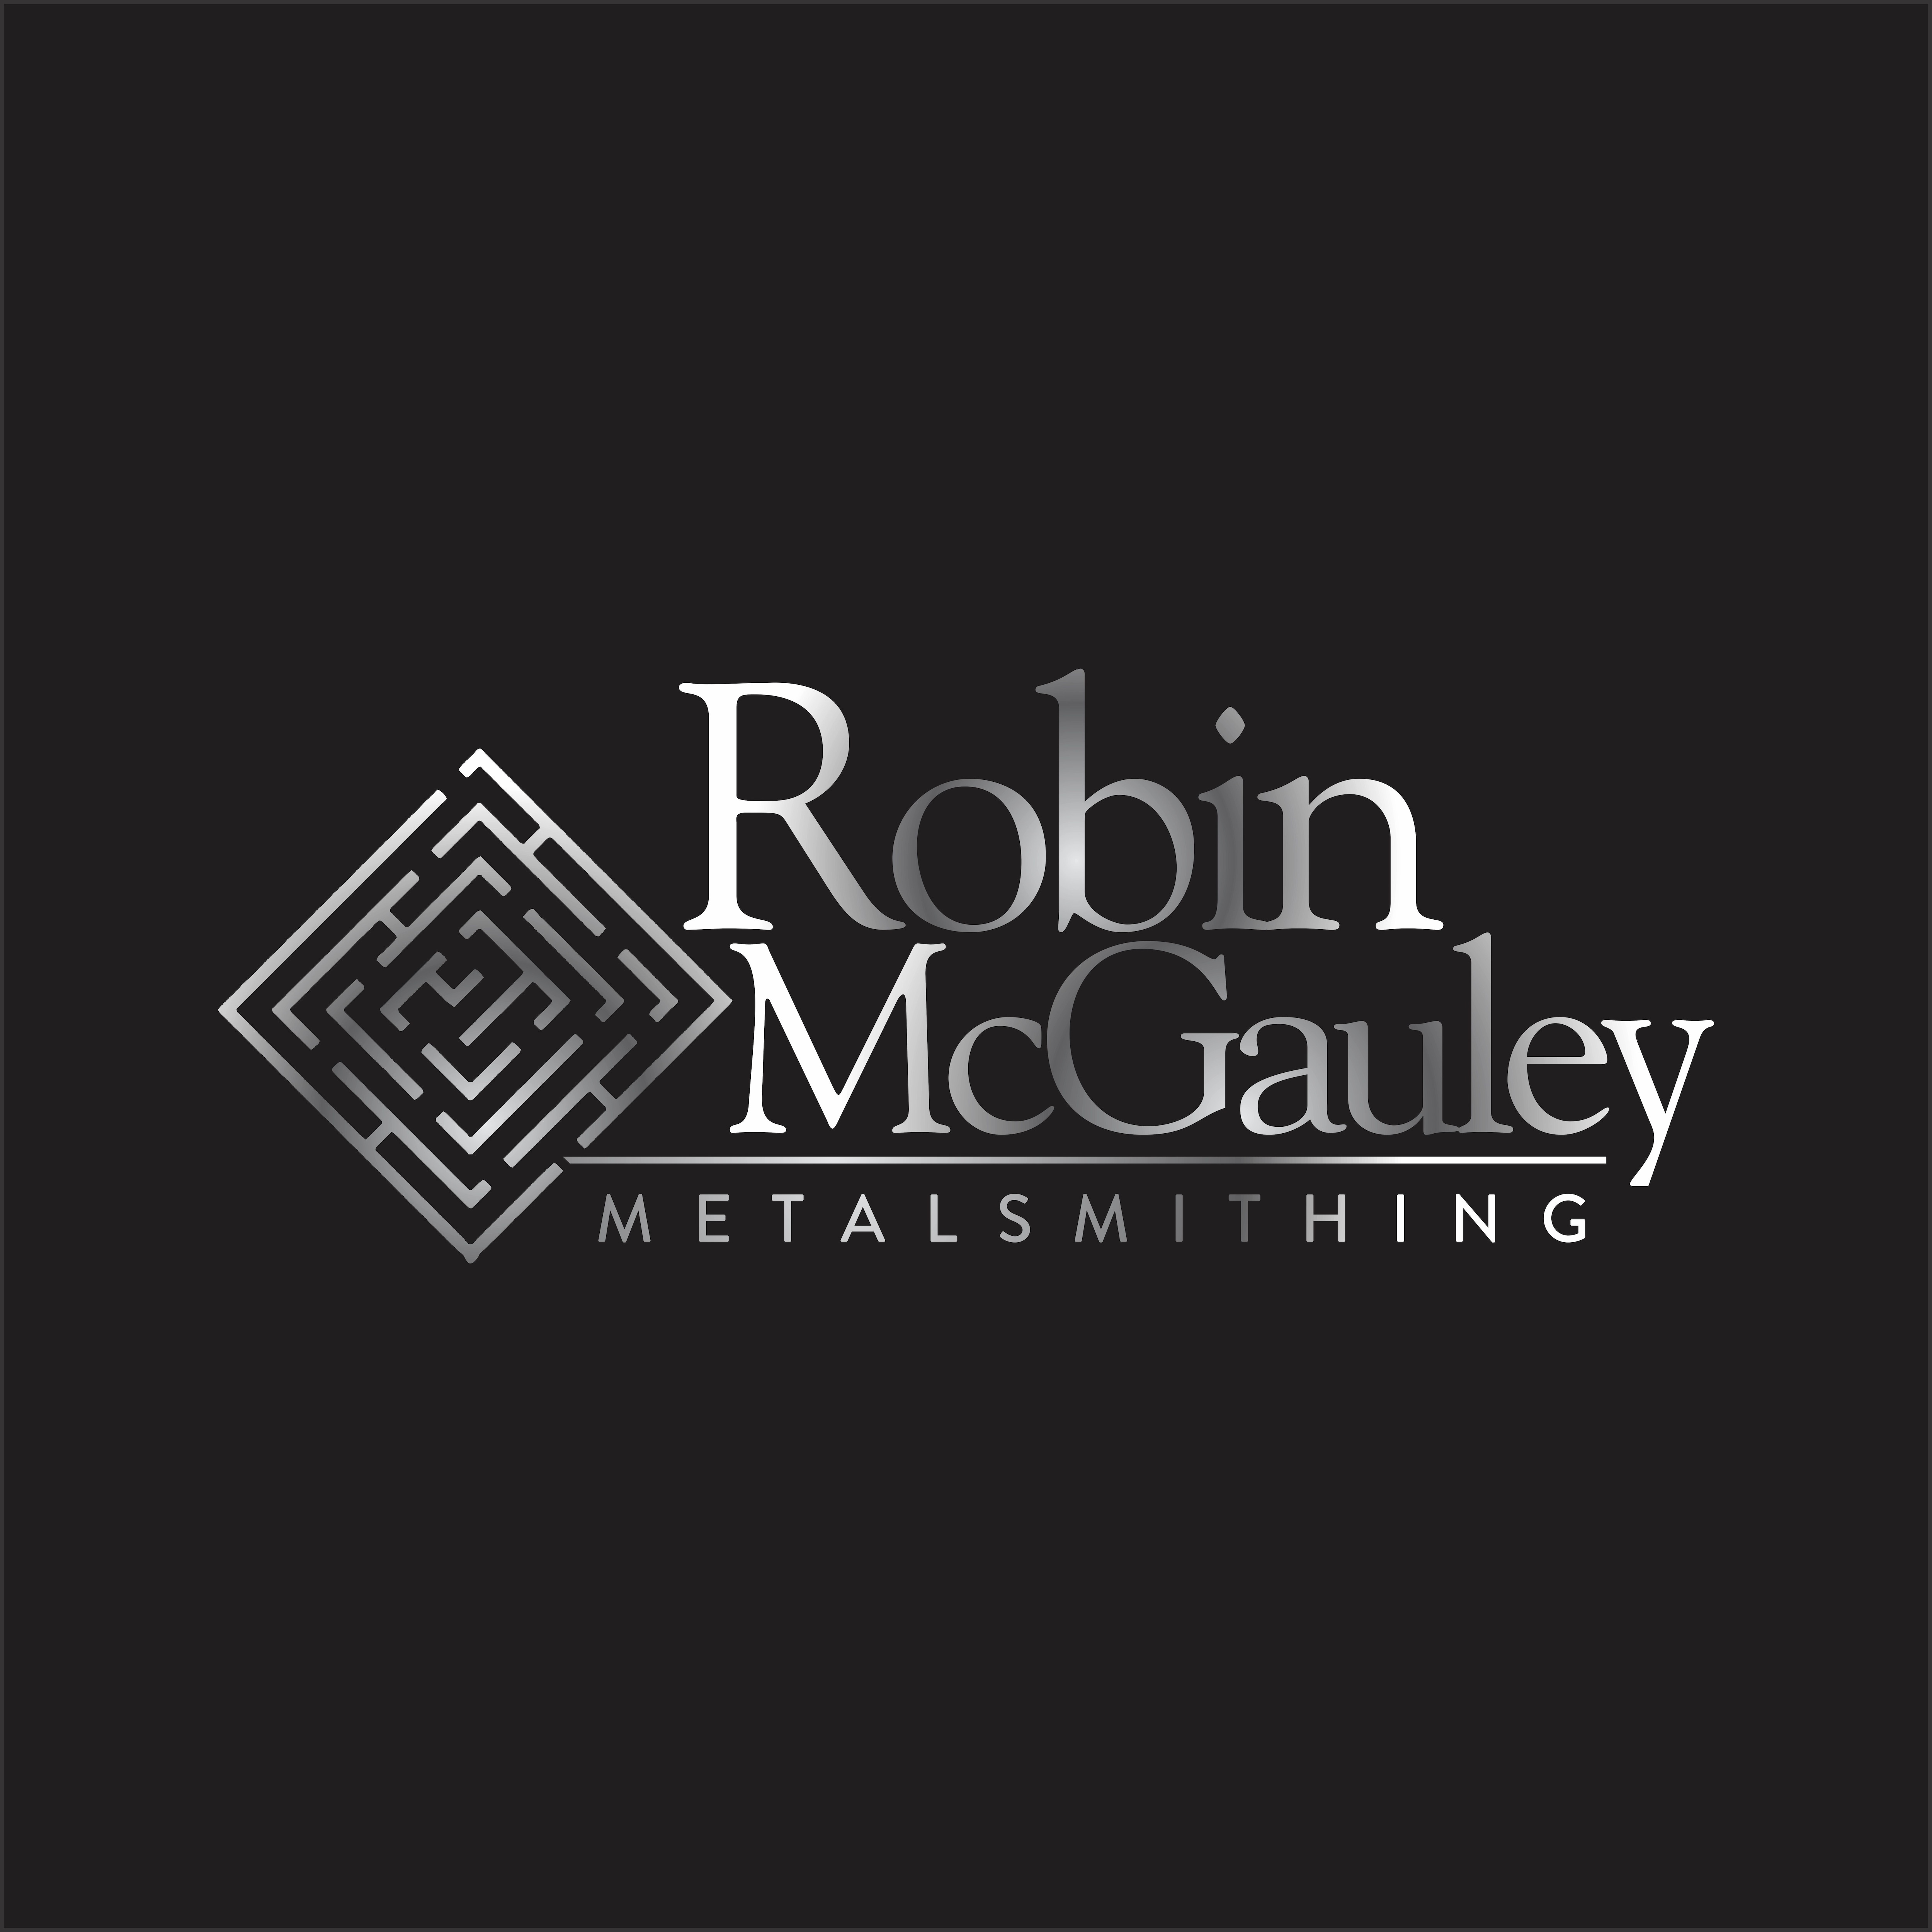 robinmcgauley